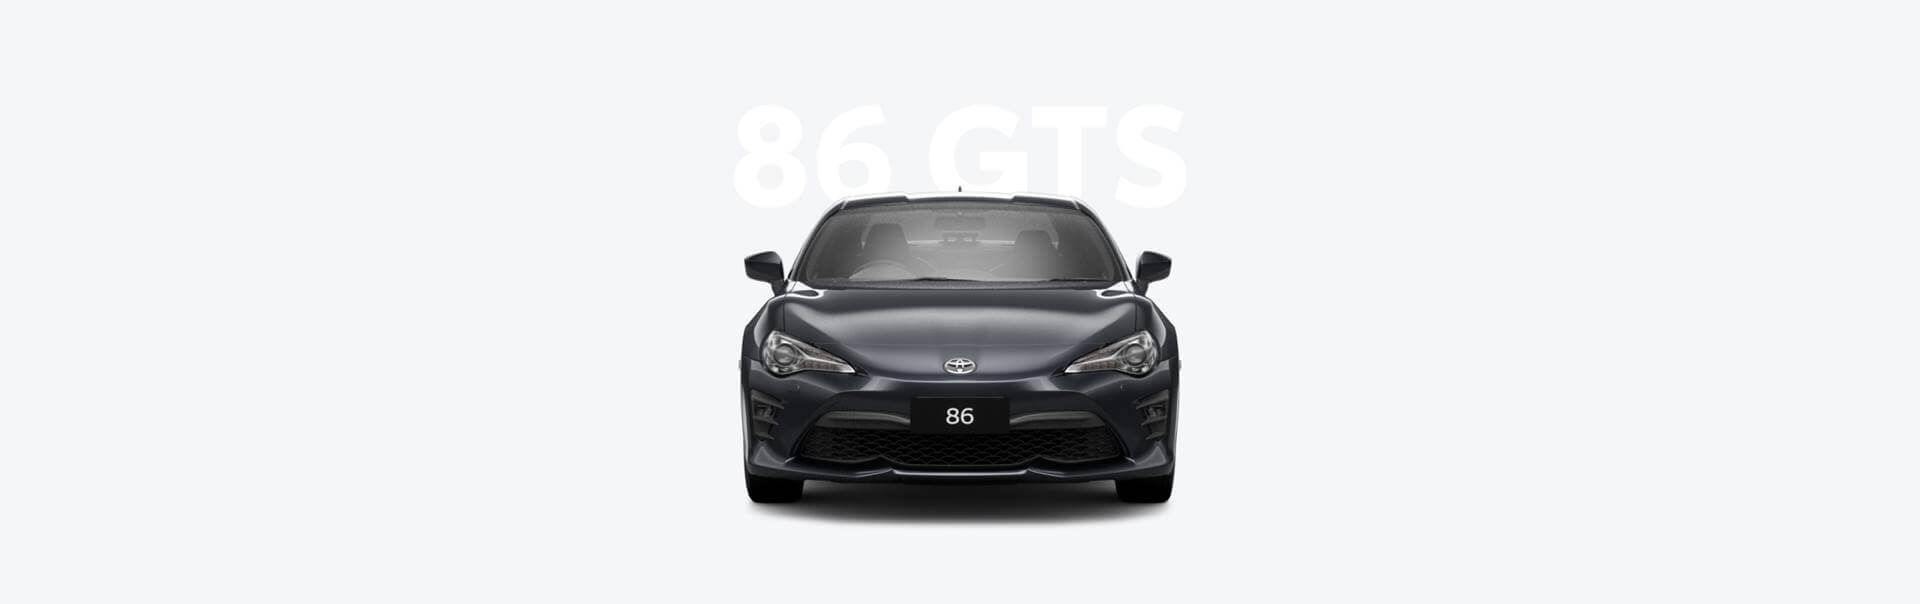 86 GTS